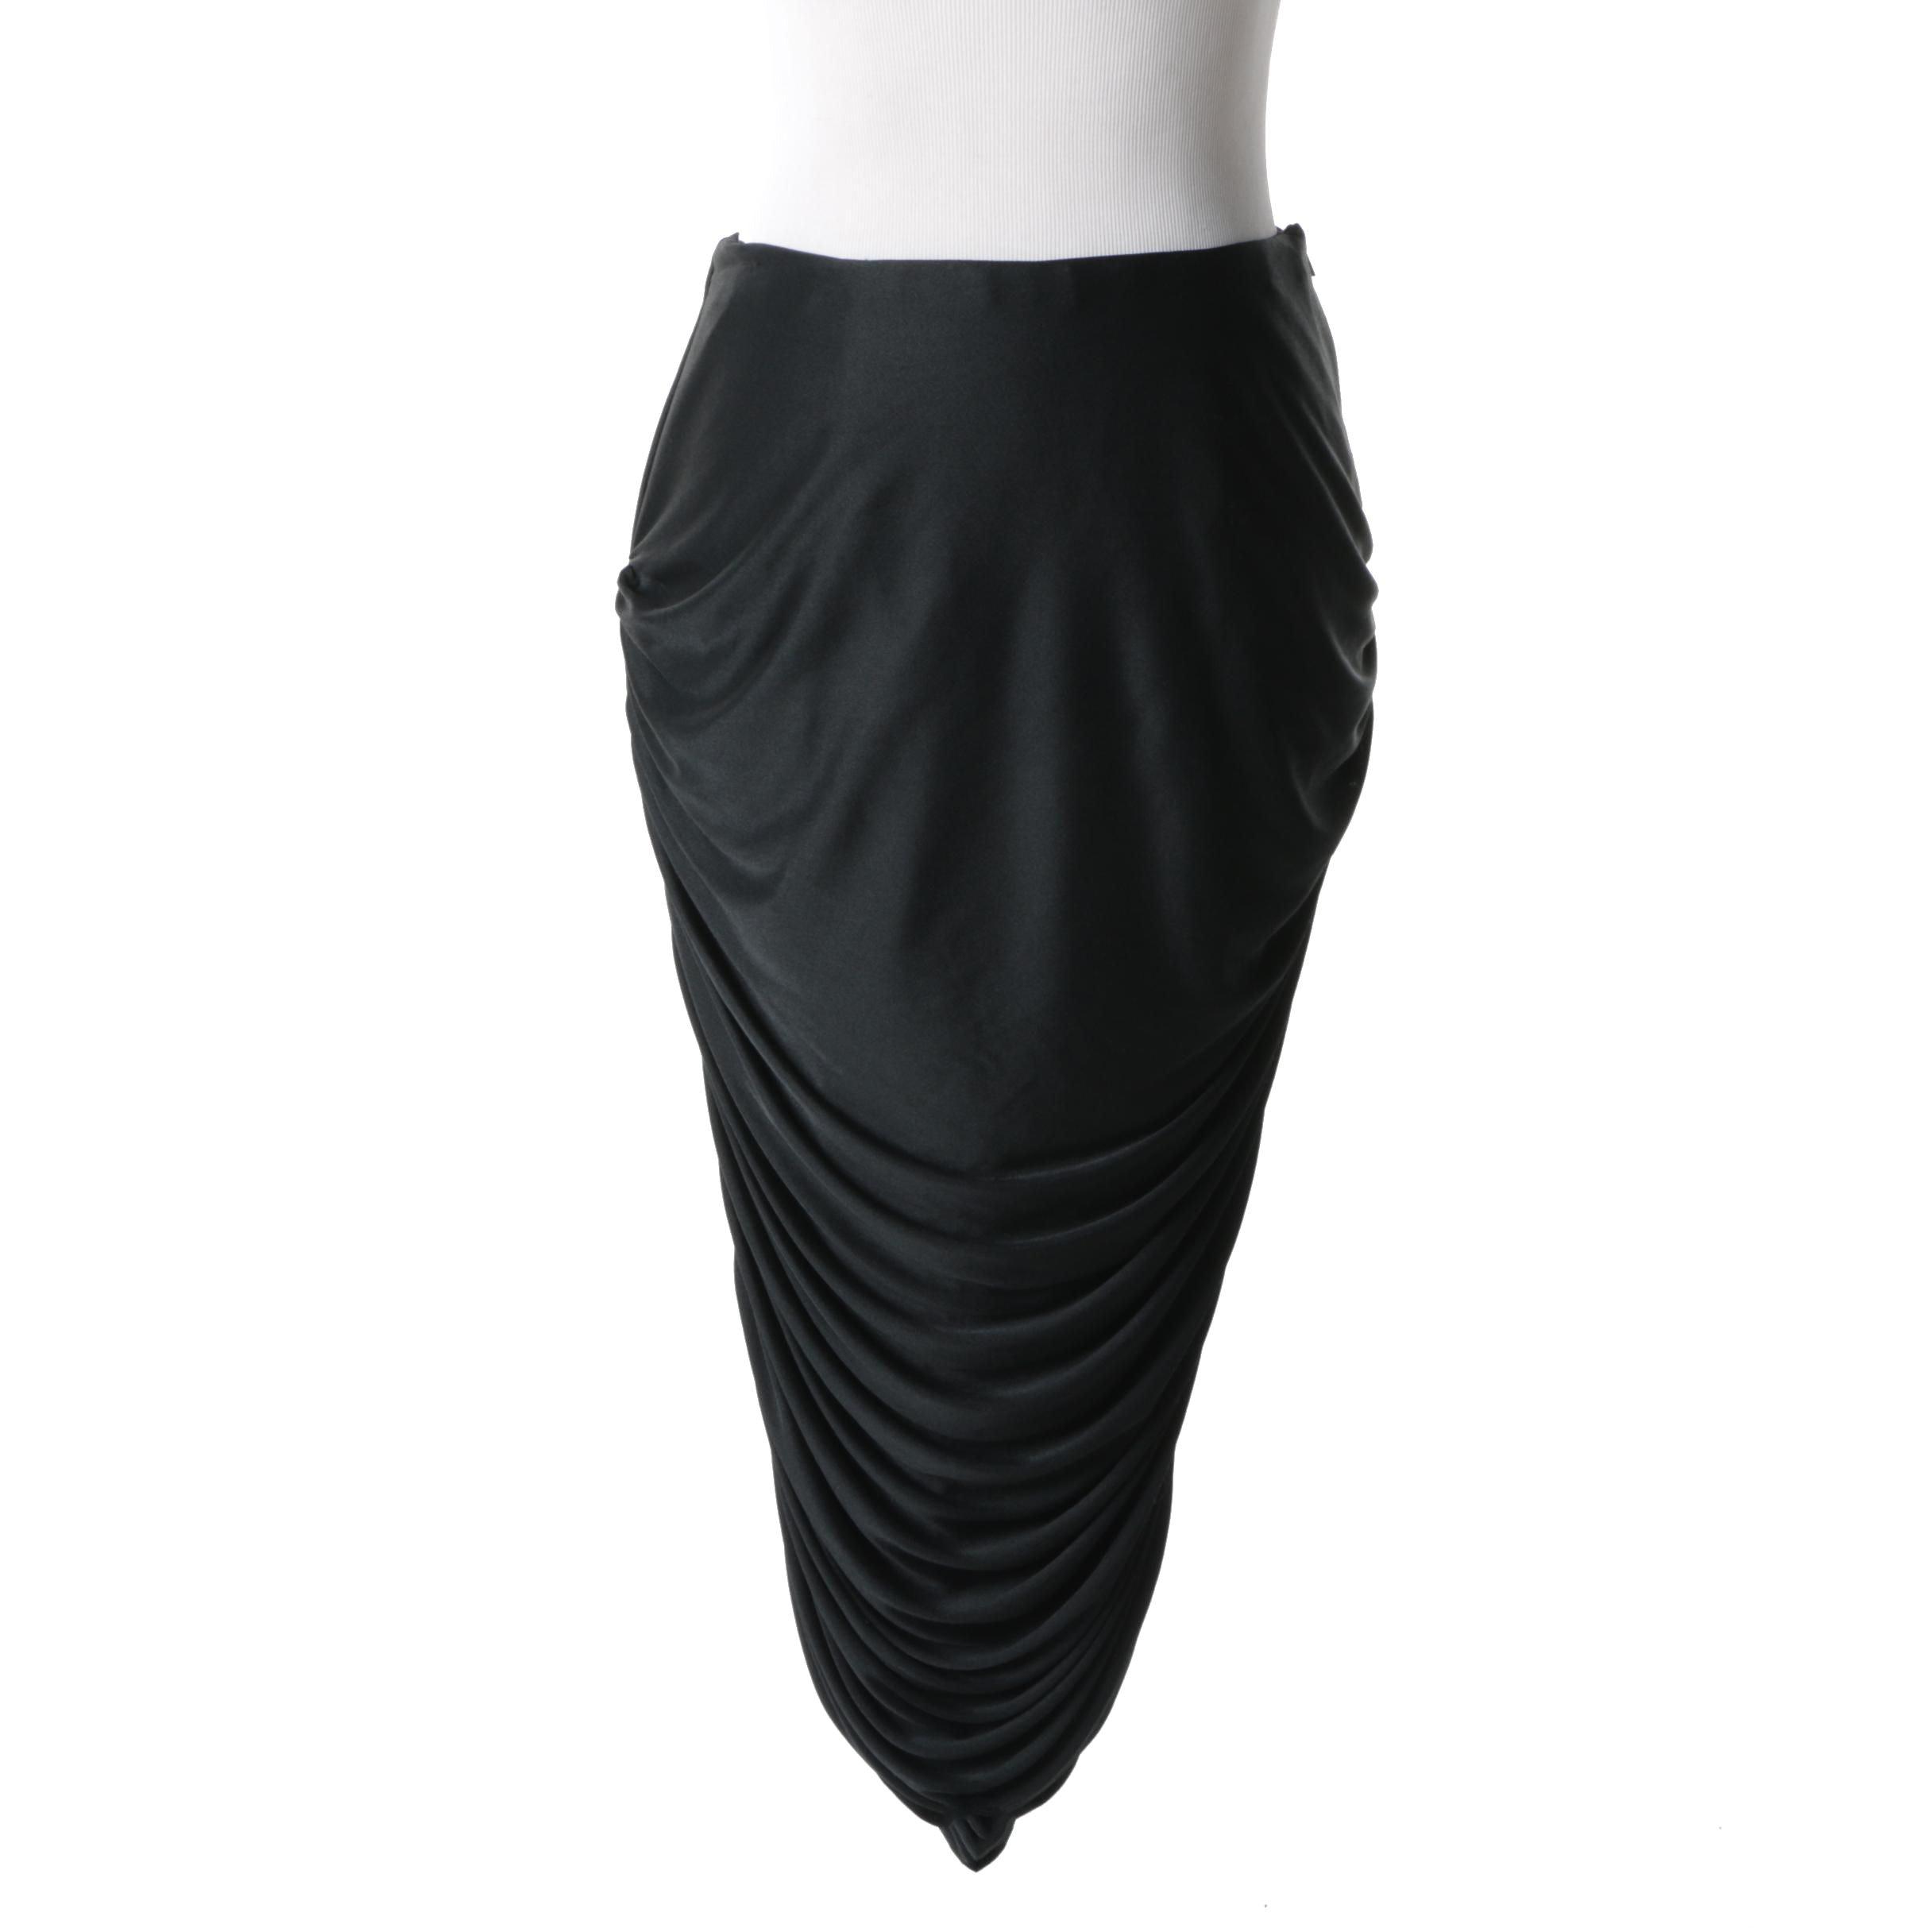 Dorzia by Jane McCartney Black Skirt